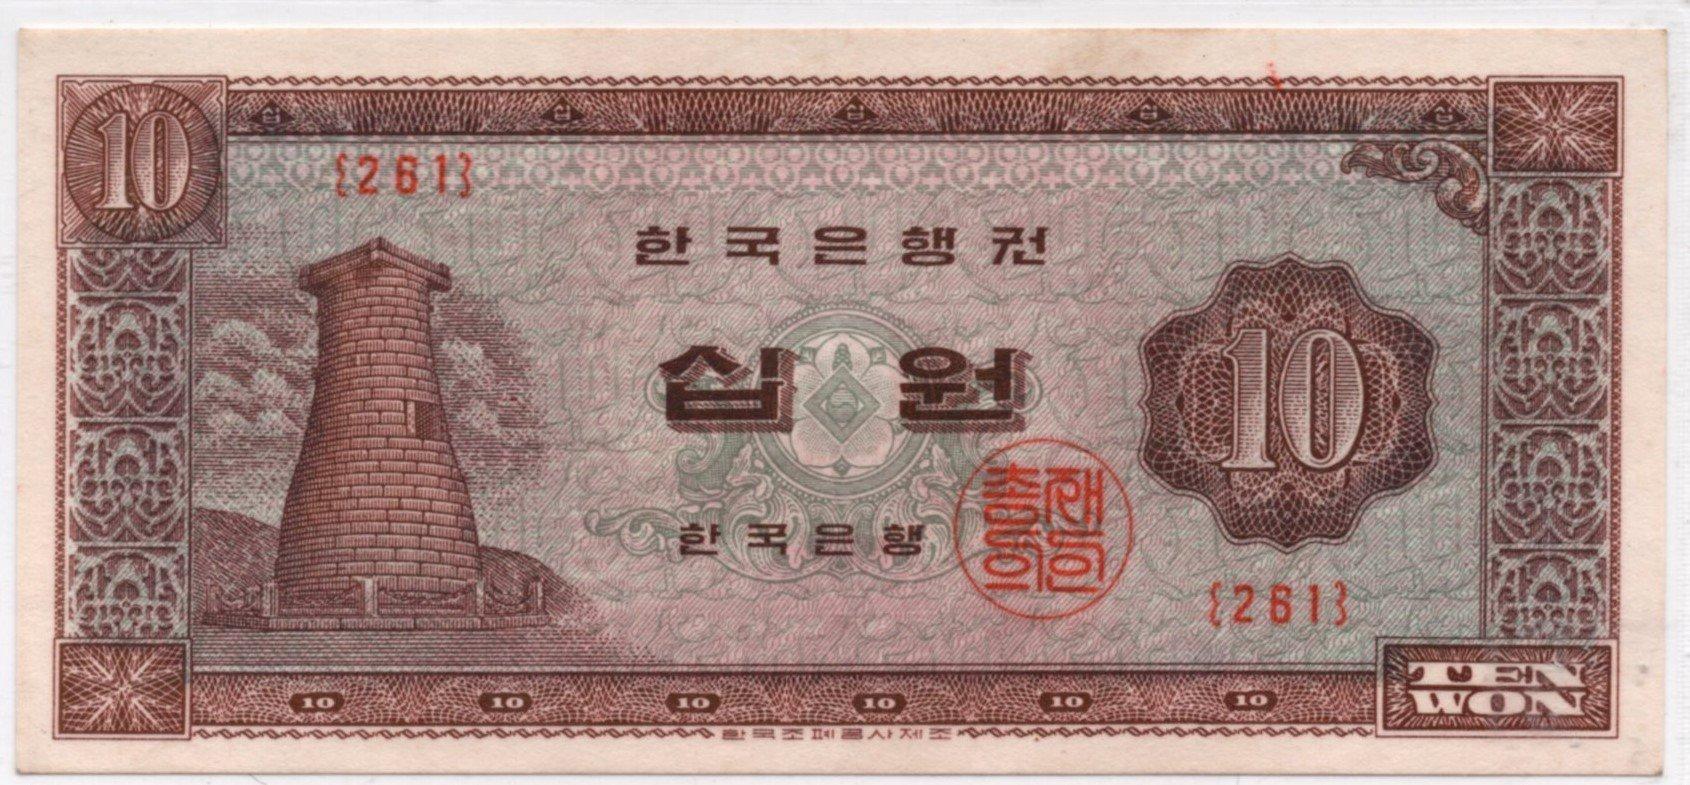 Skorea 10 won P33